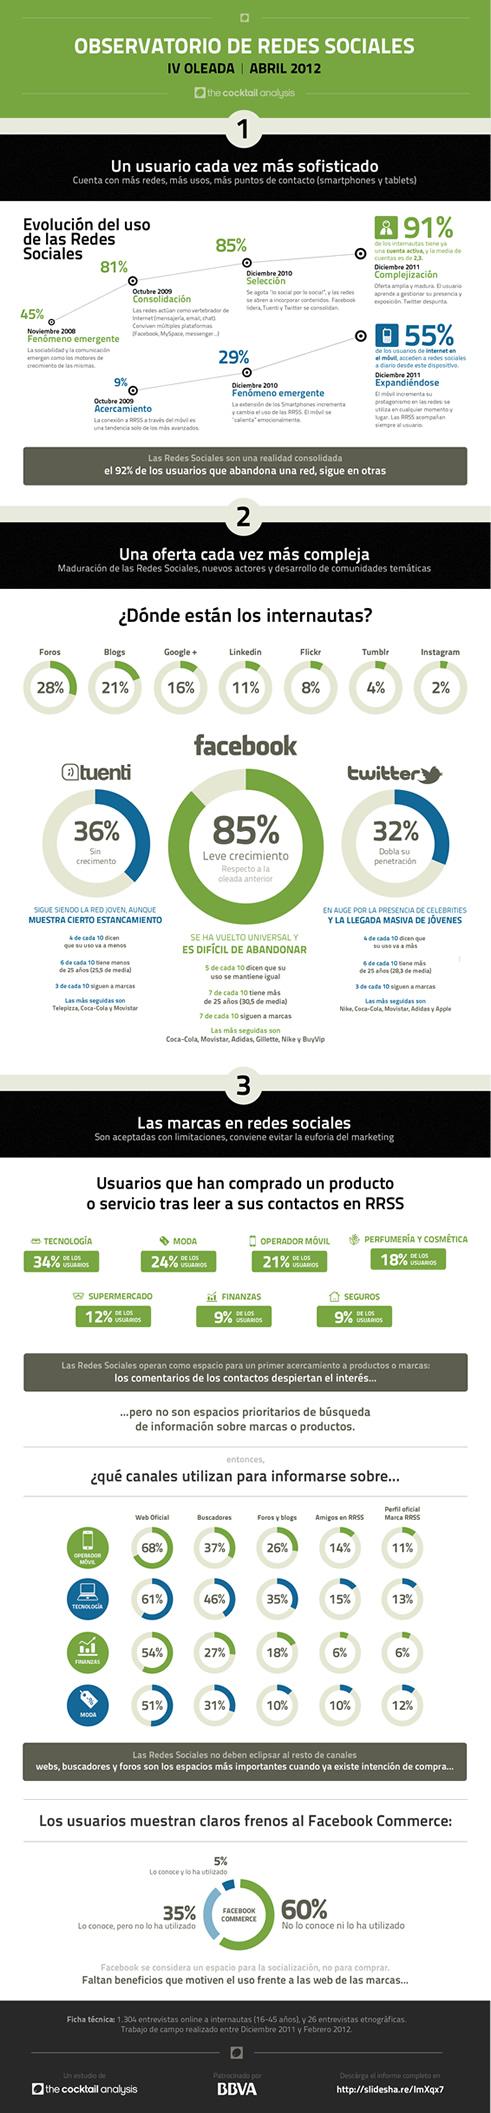 infografia_4oleada_observatorioredessociales